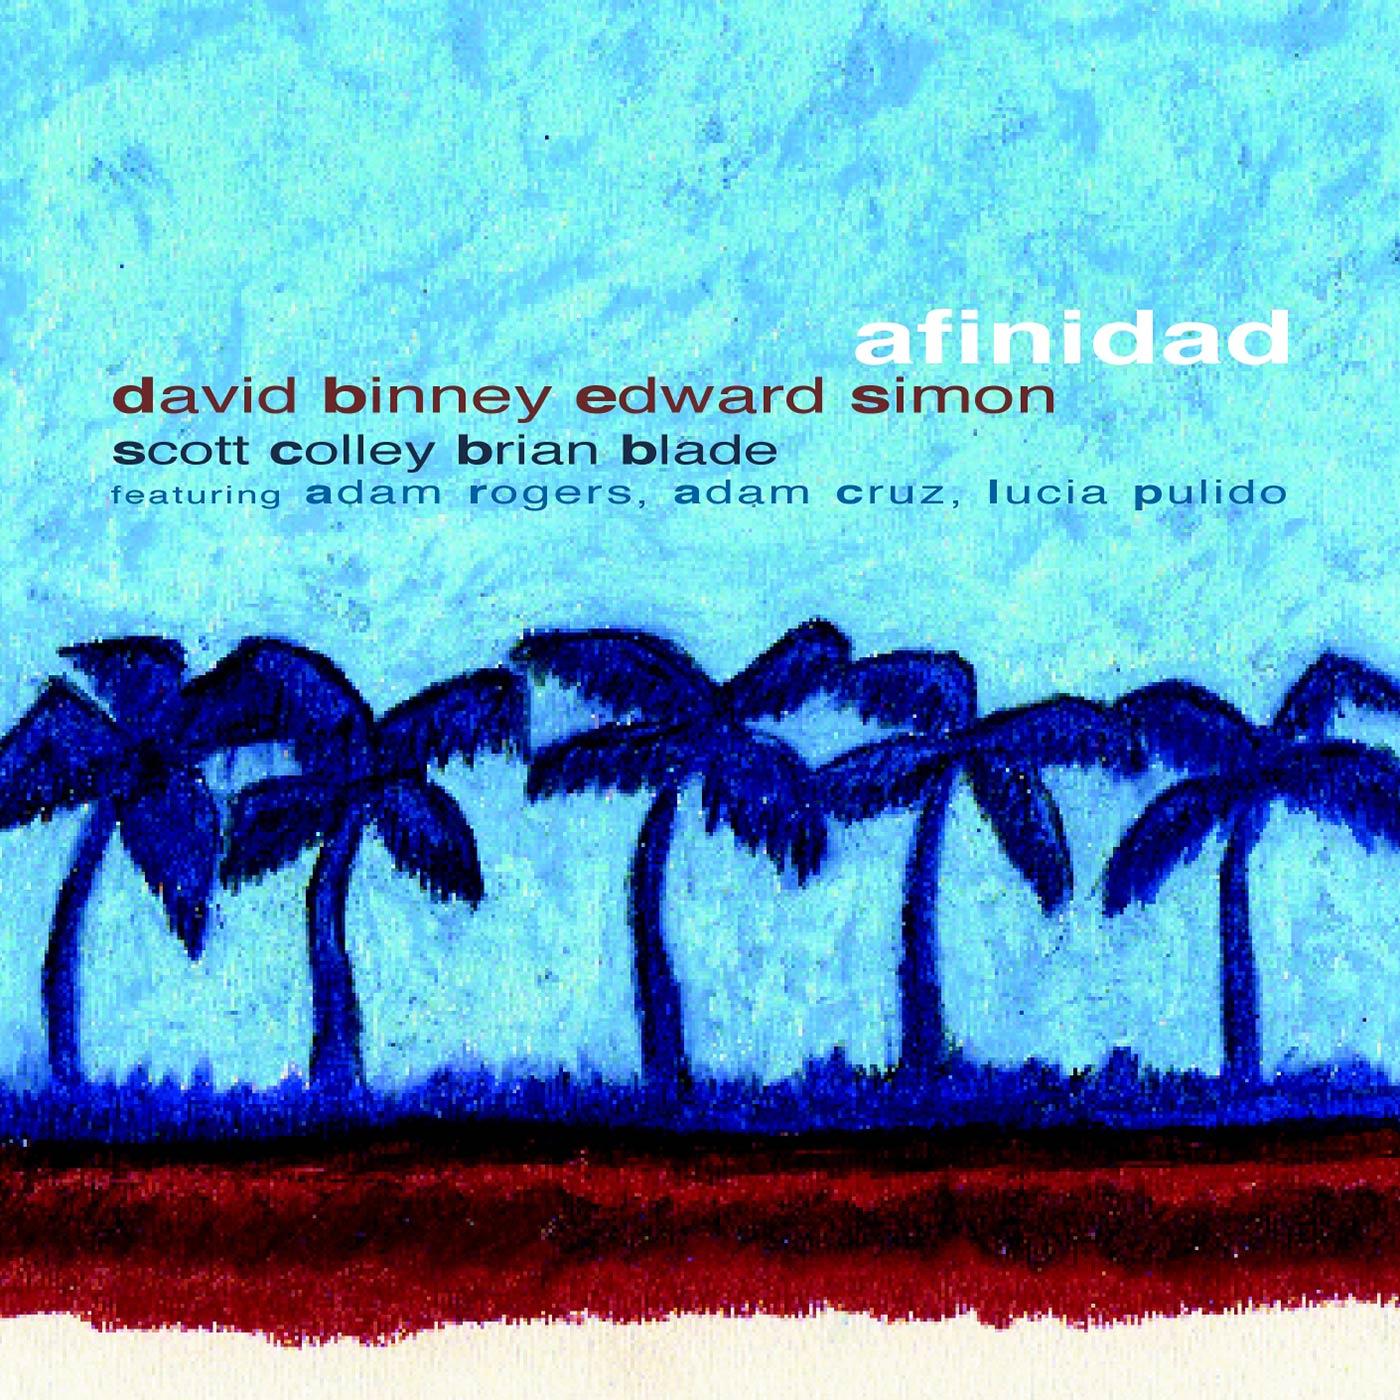 Afinidad - David Binney & Edward Simon